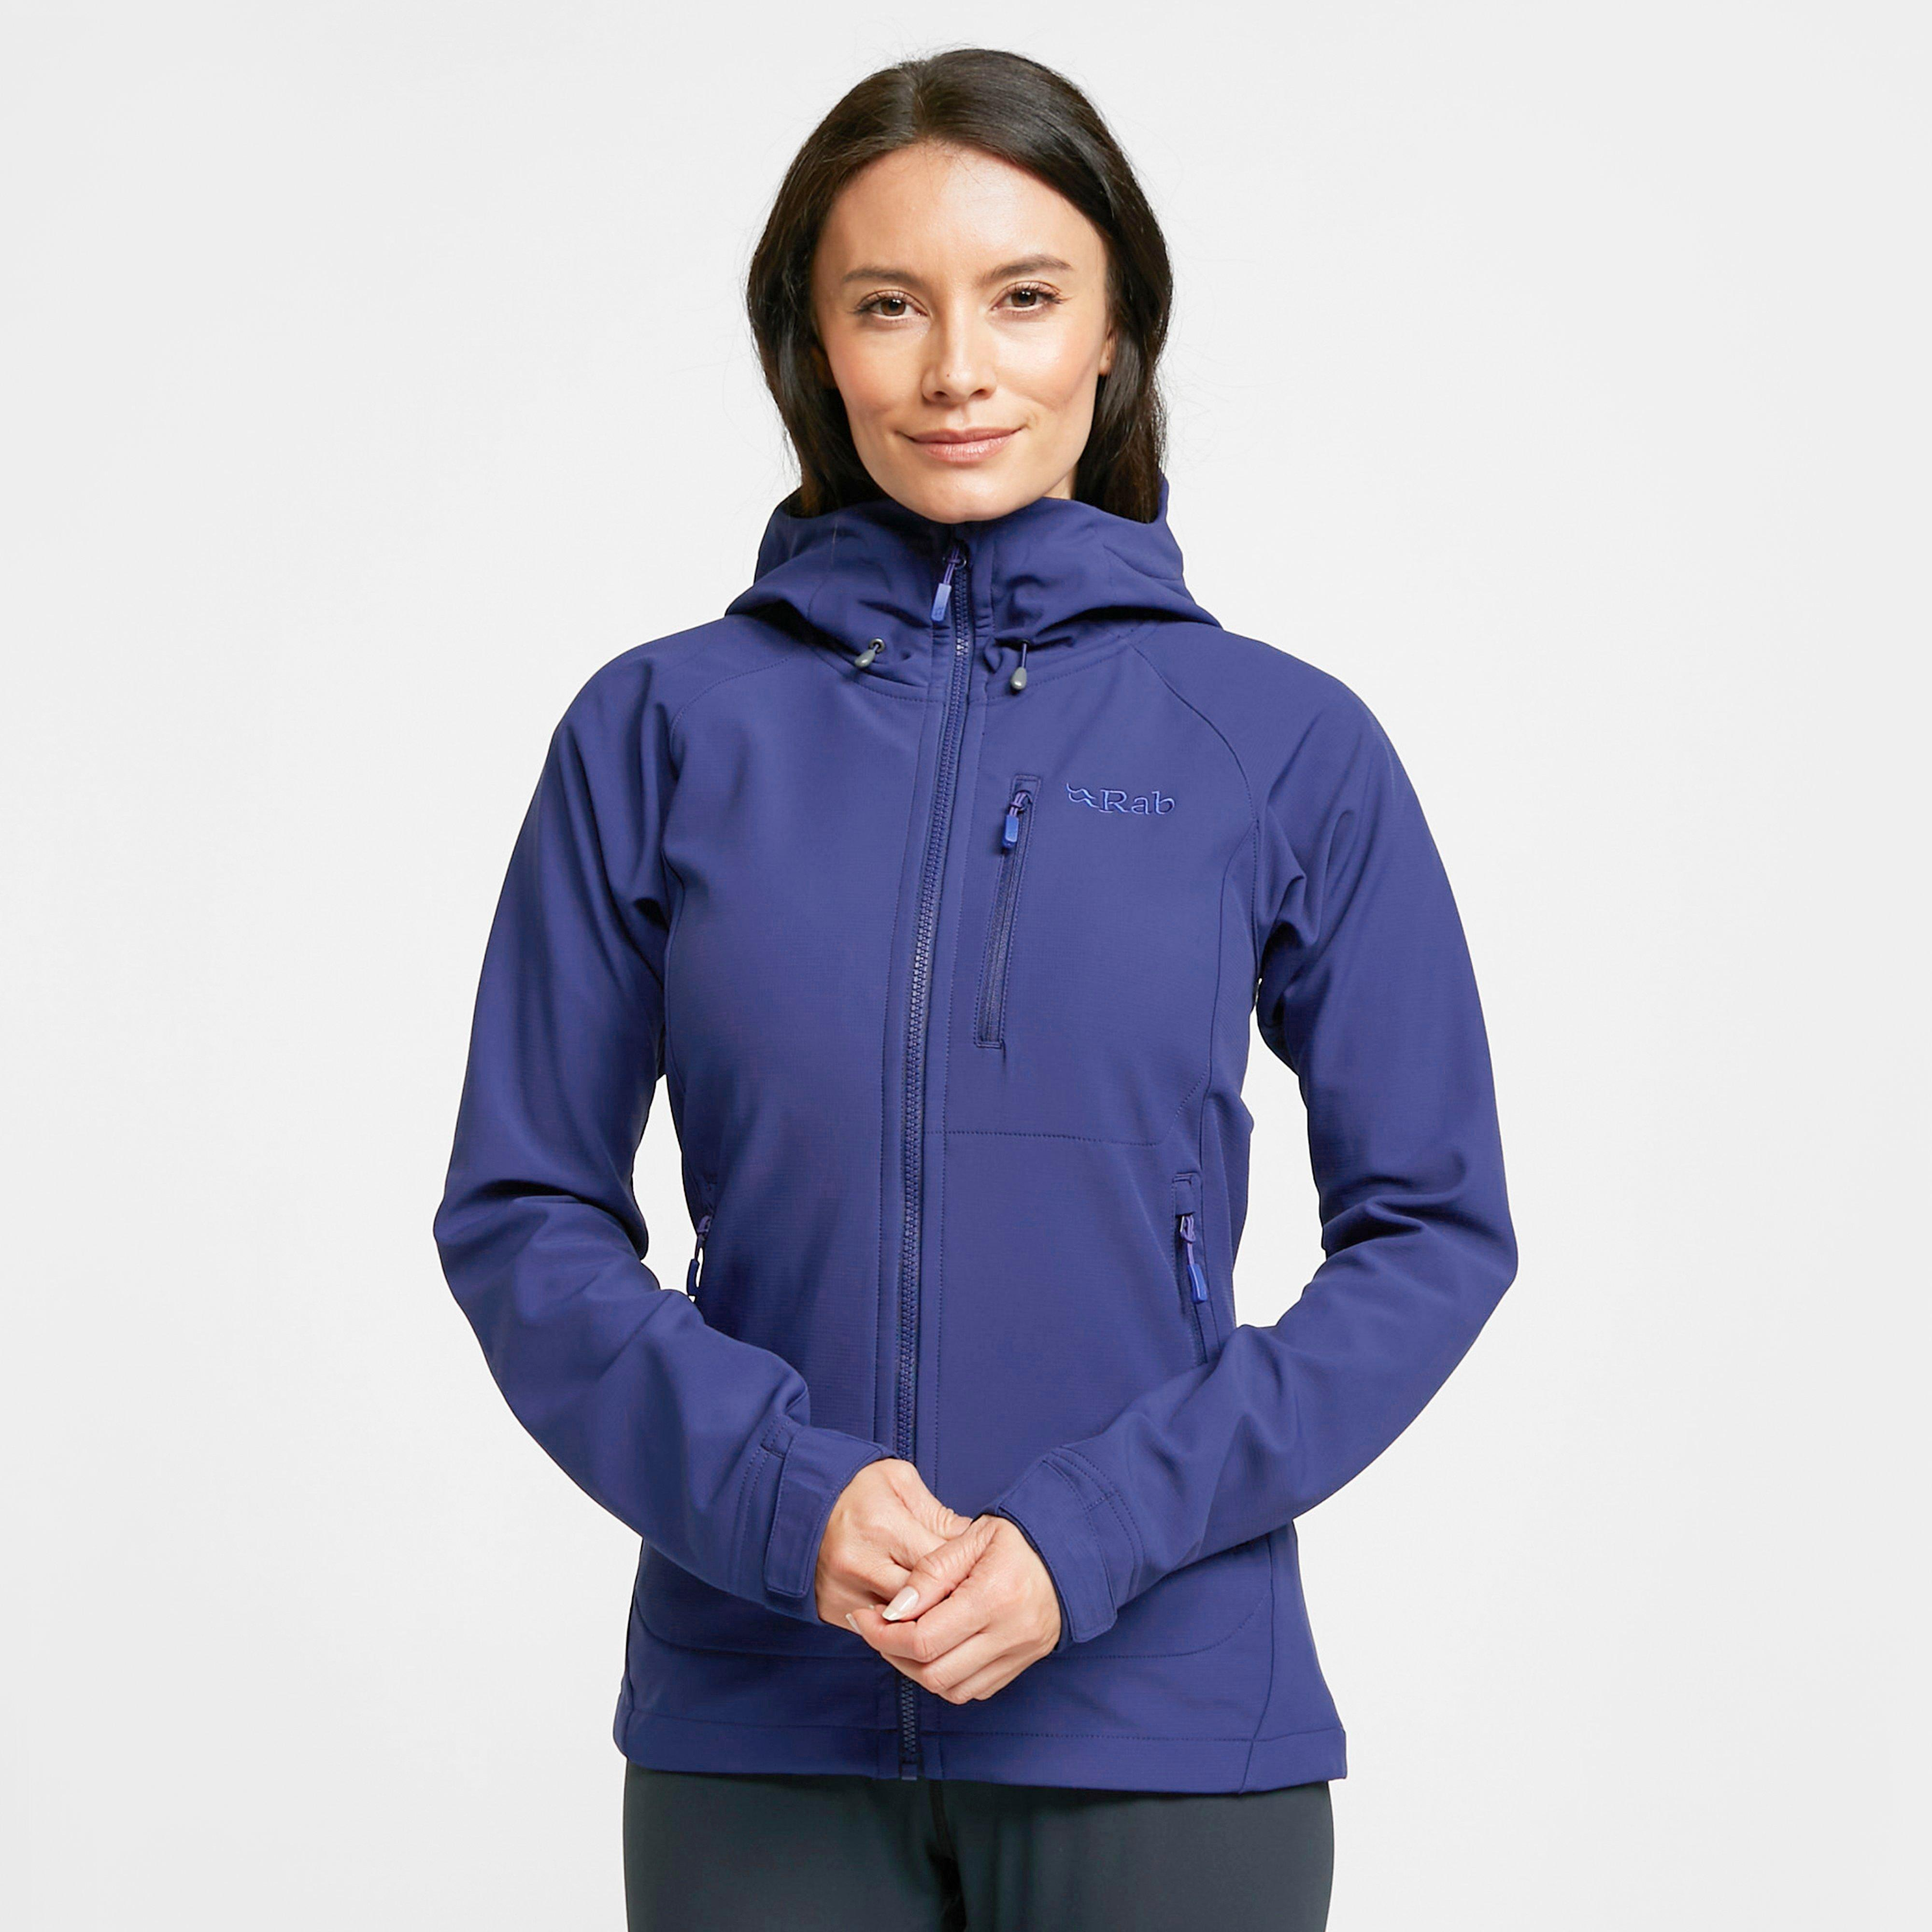 Rab Rab Womens Salvo Jacket - N/A, N/A